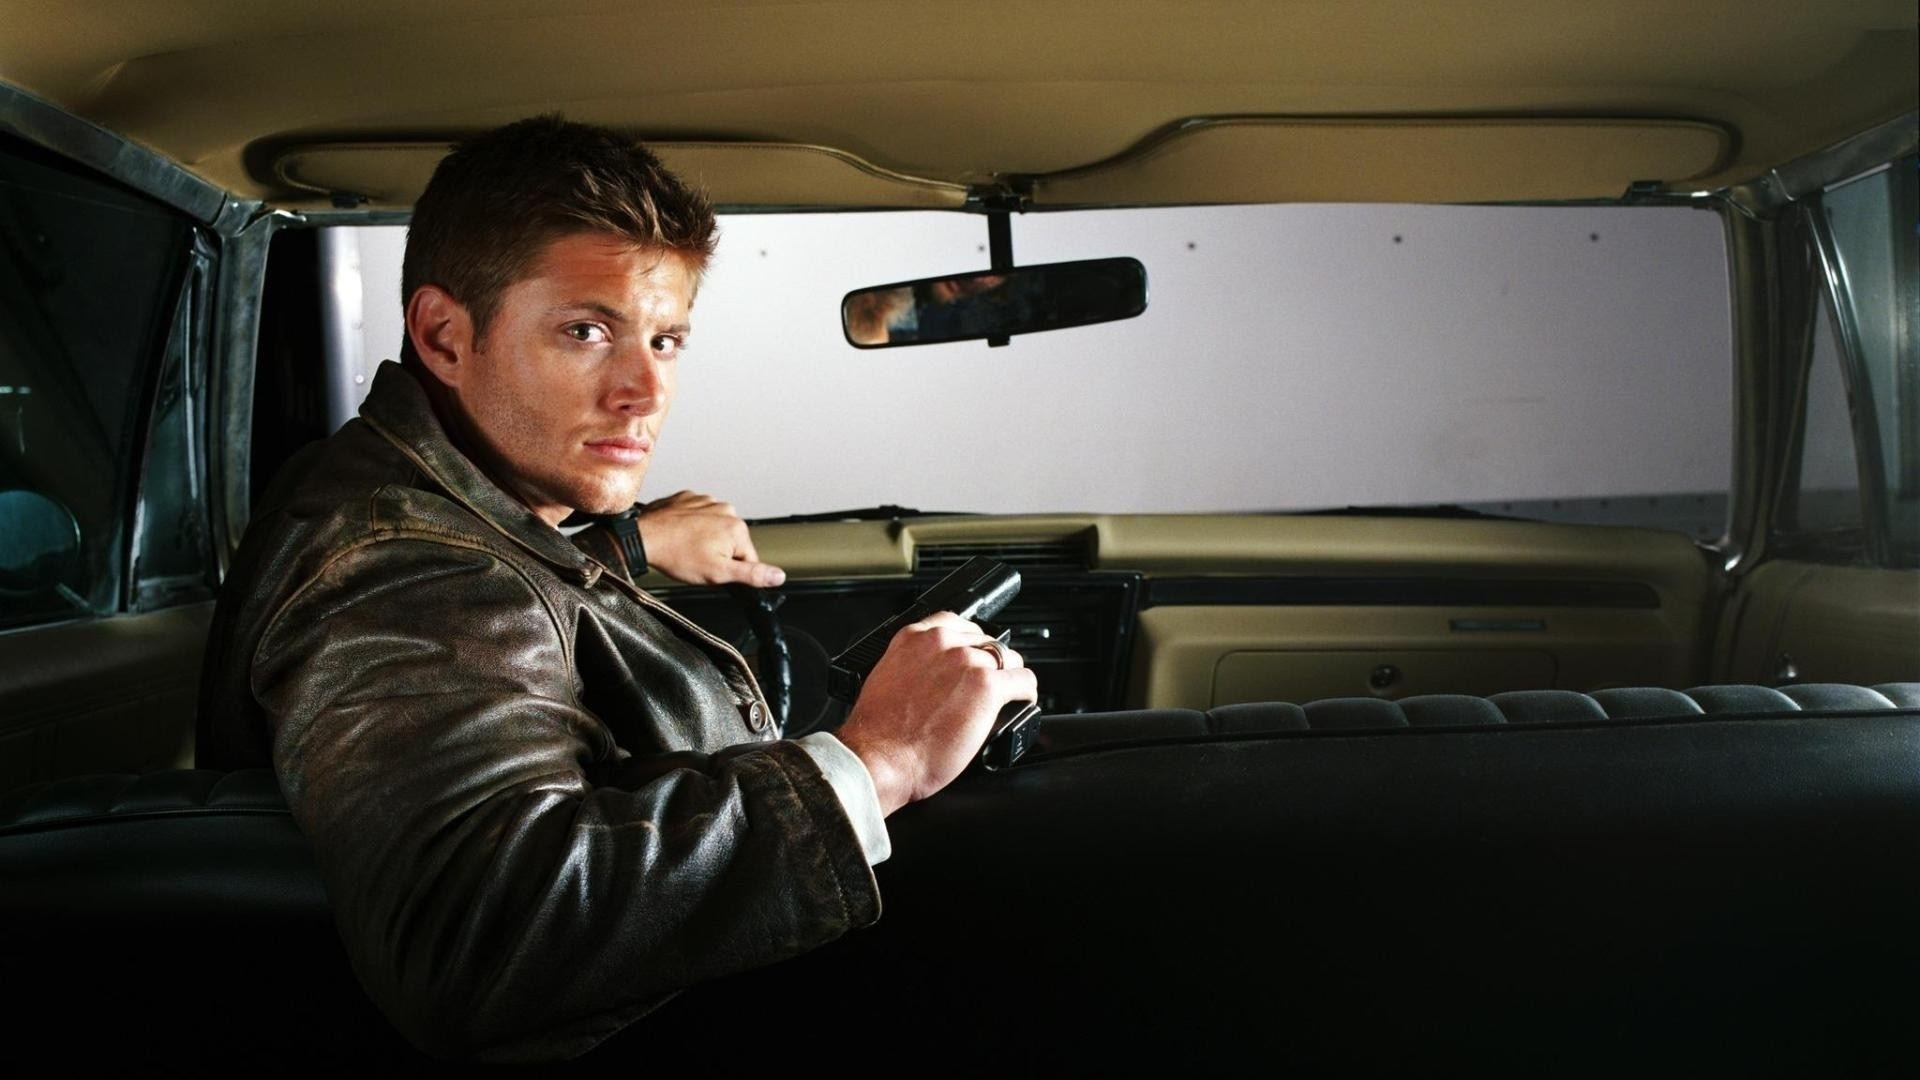 Jensen Ackles Wallpaper Hd 83 Images